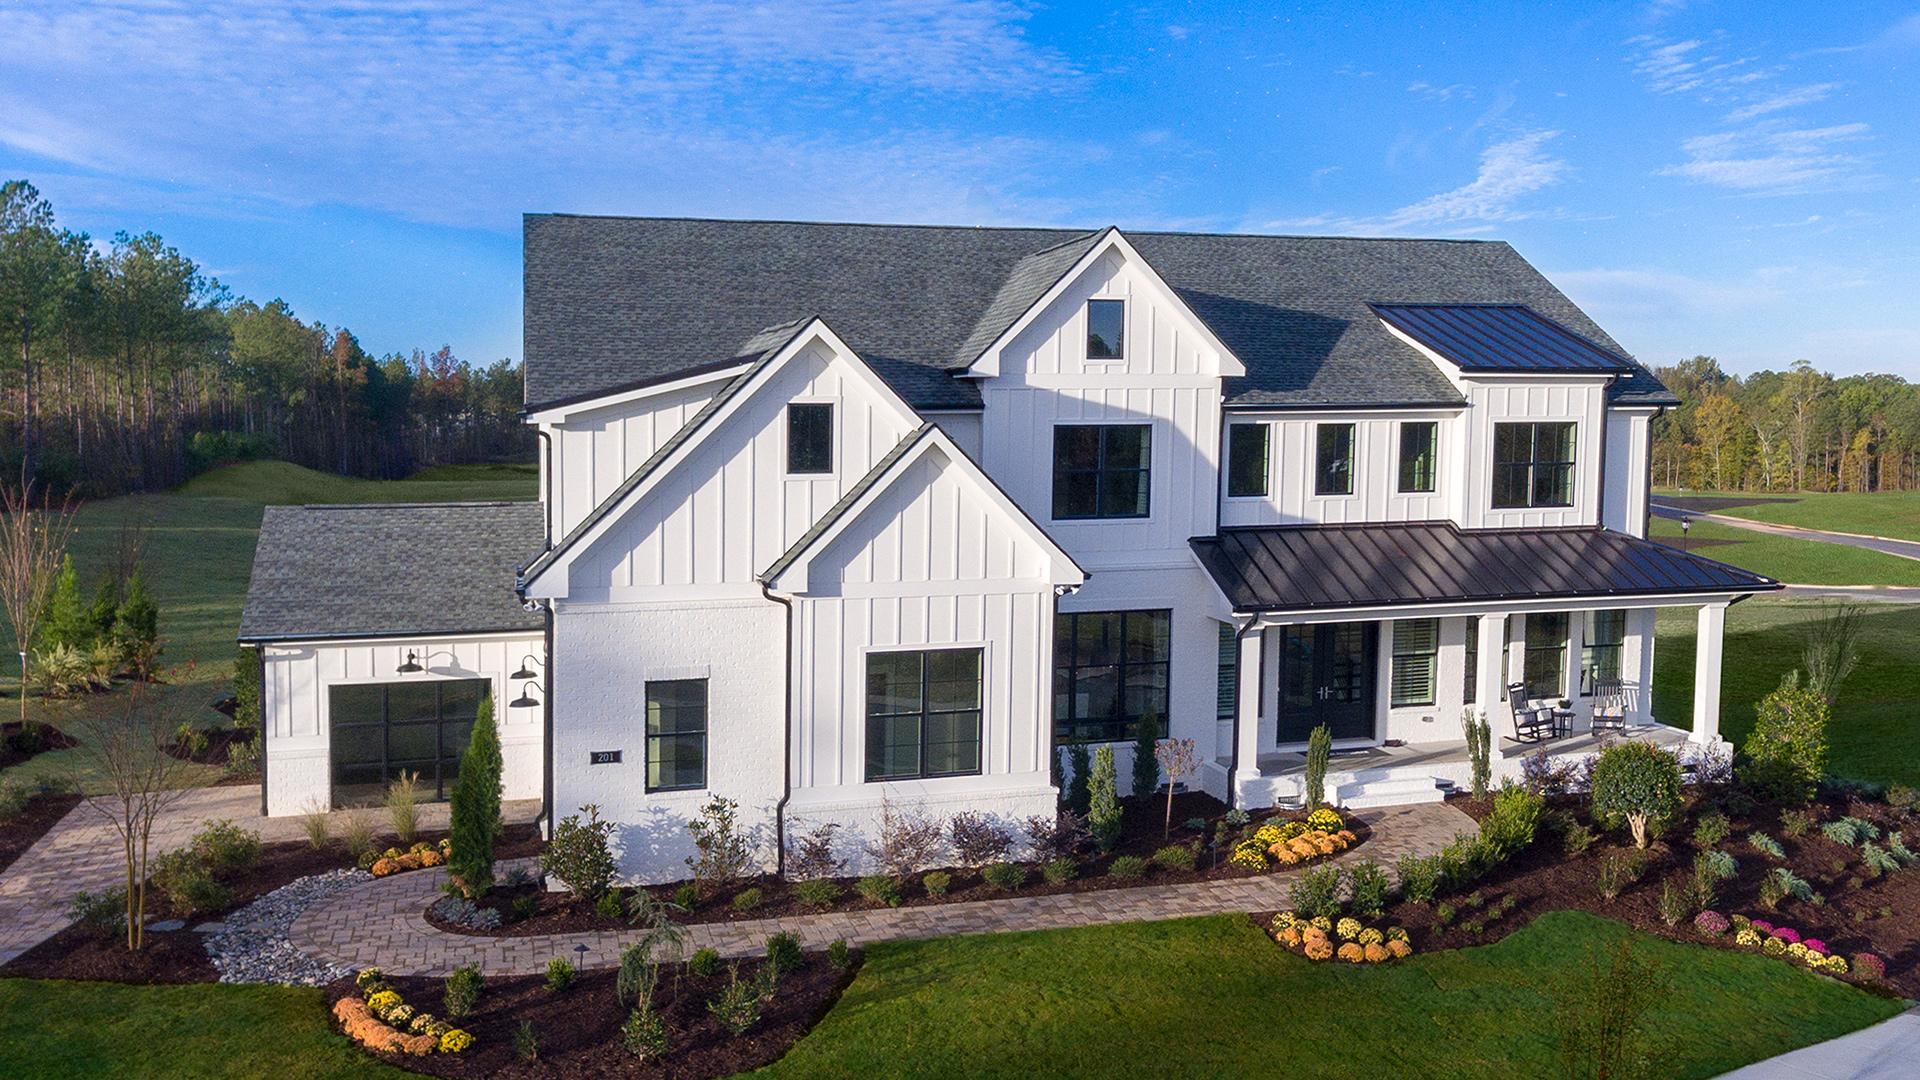 Award-winning Hollister model home